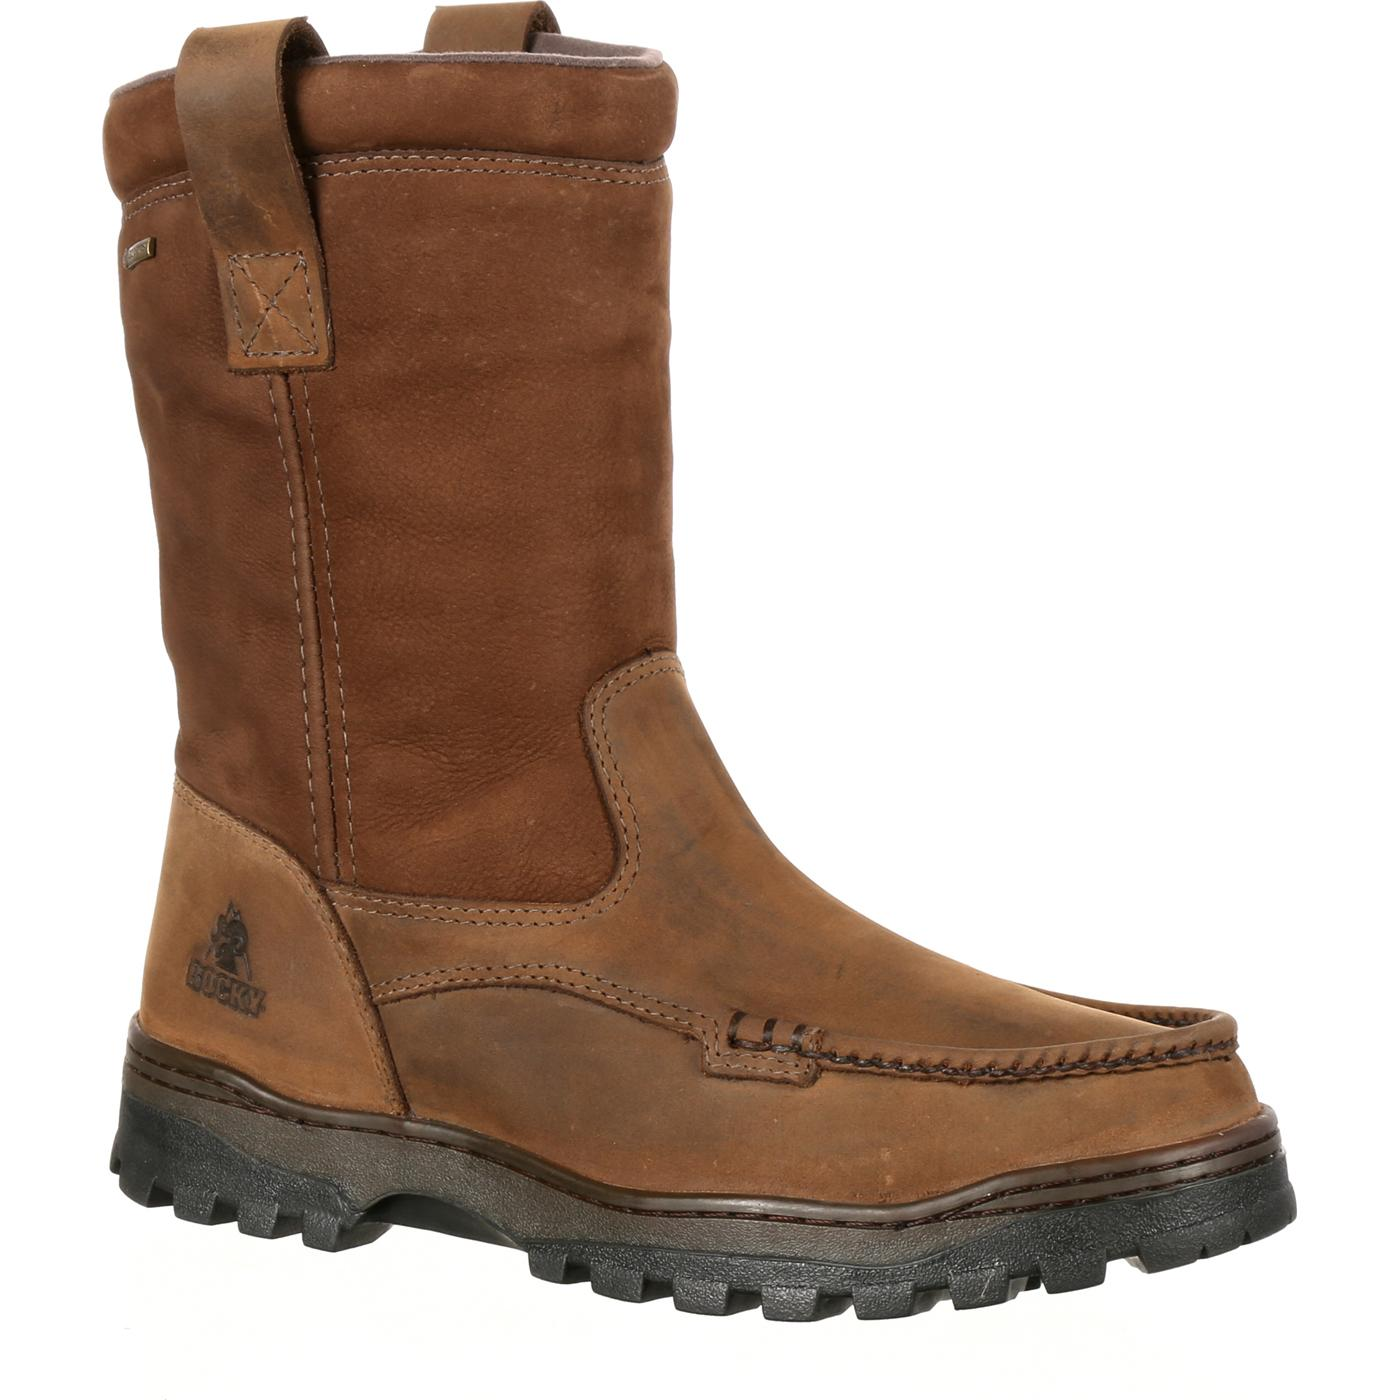 Rocky Outback: GORE-TEX Waterproof Wellington Moc Toe Boot